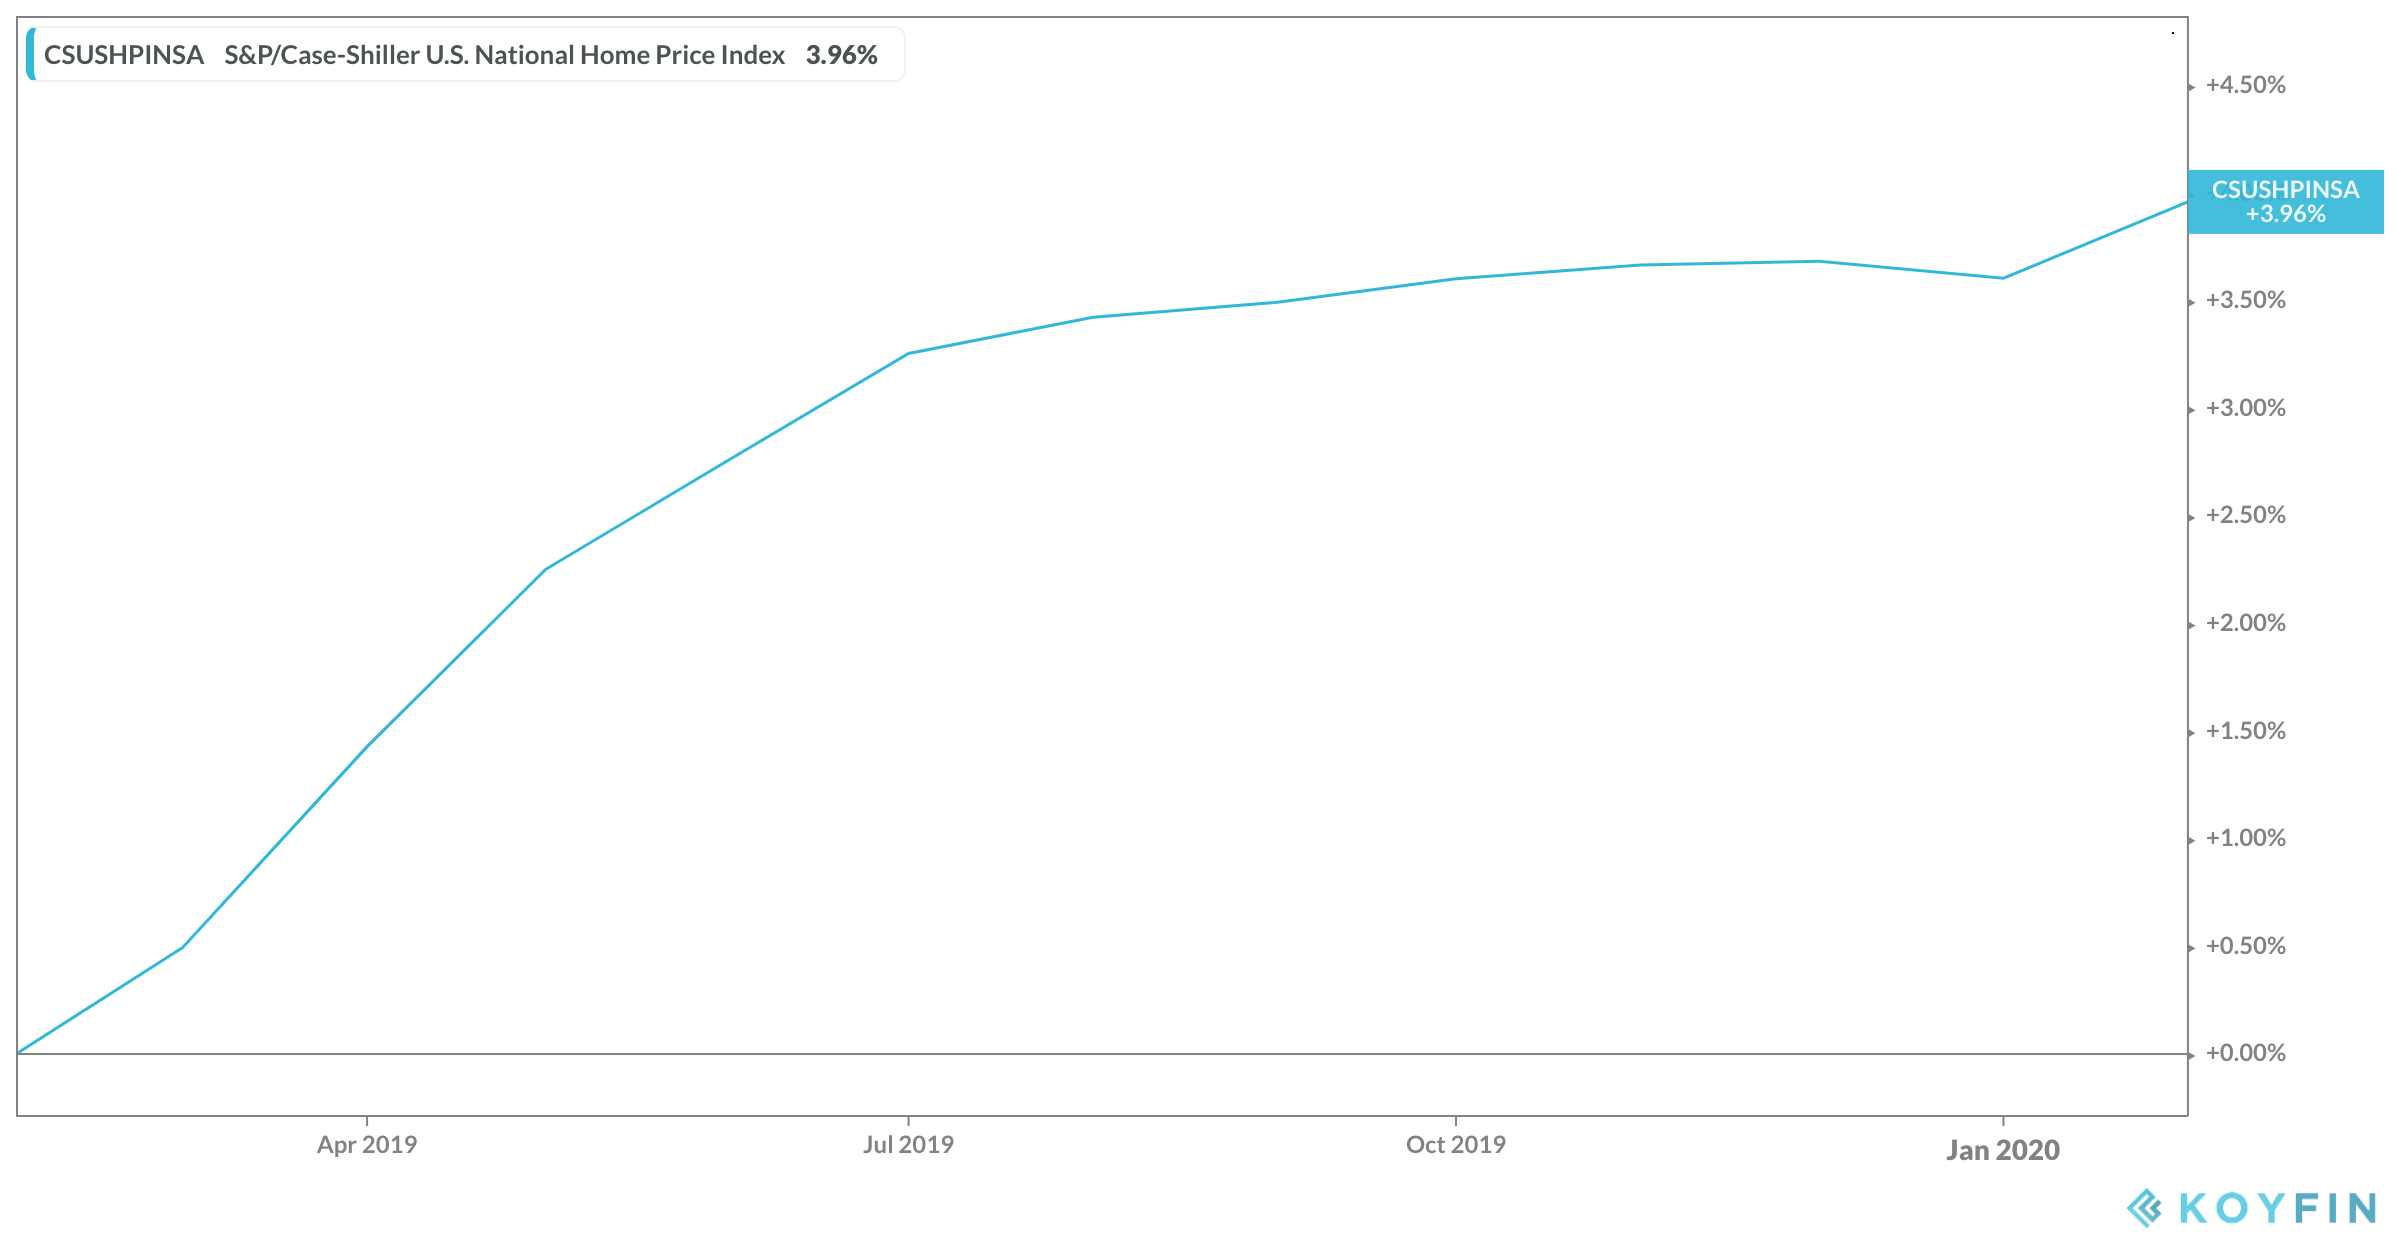 February 2020 Case Shiller Index chart